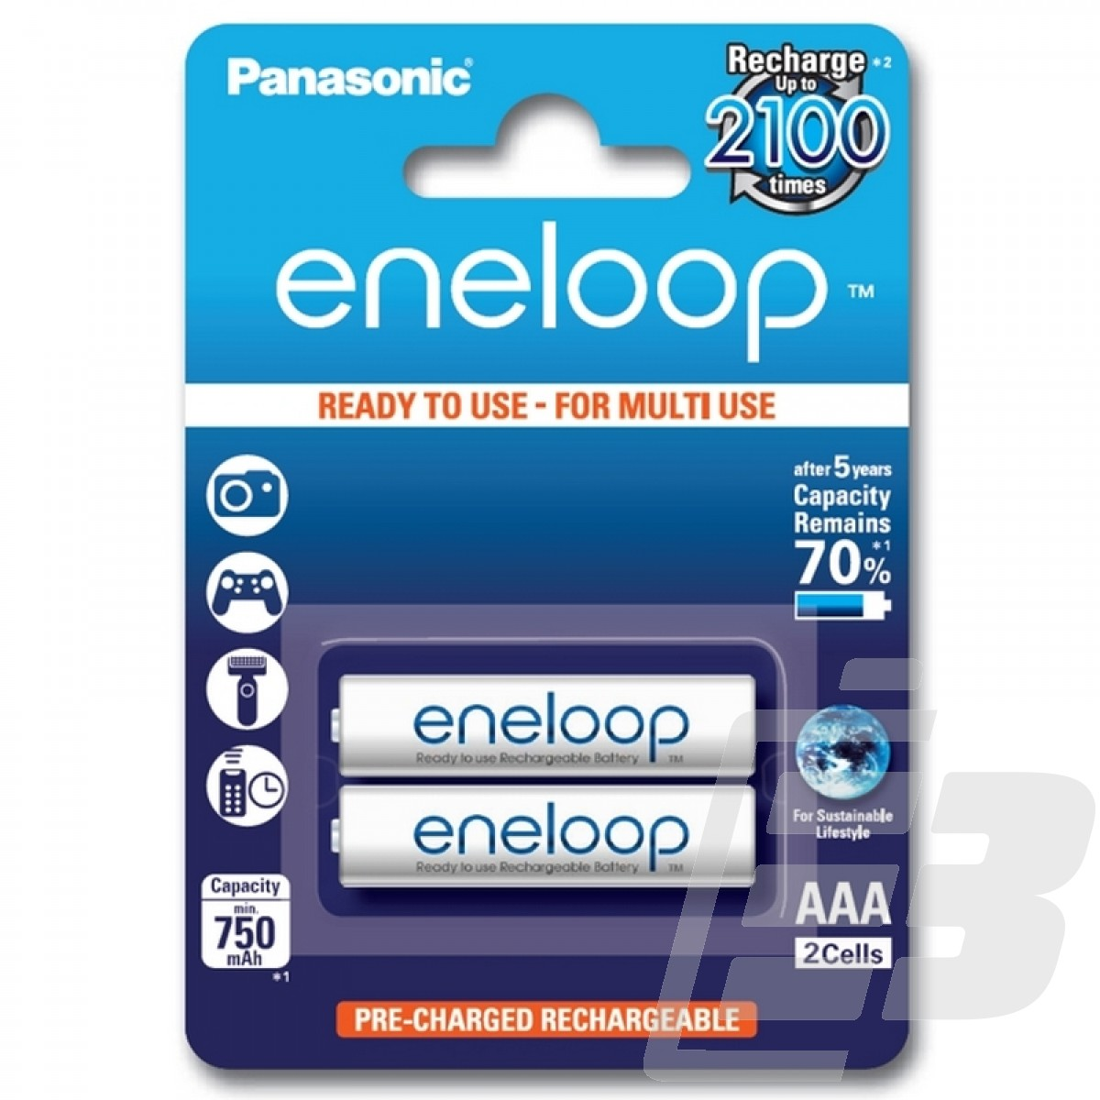 Eneloop AAA PreCharged Battery 750mah 1